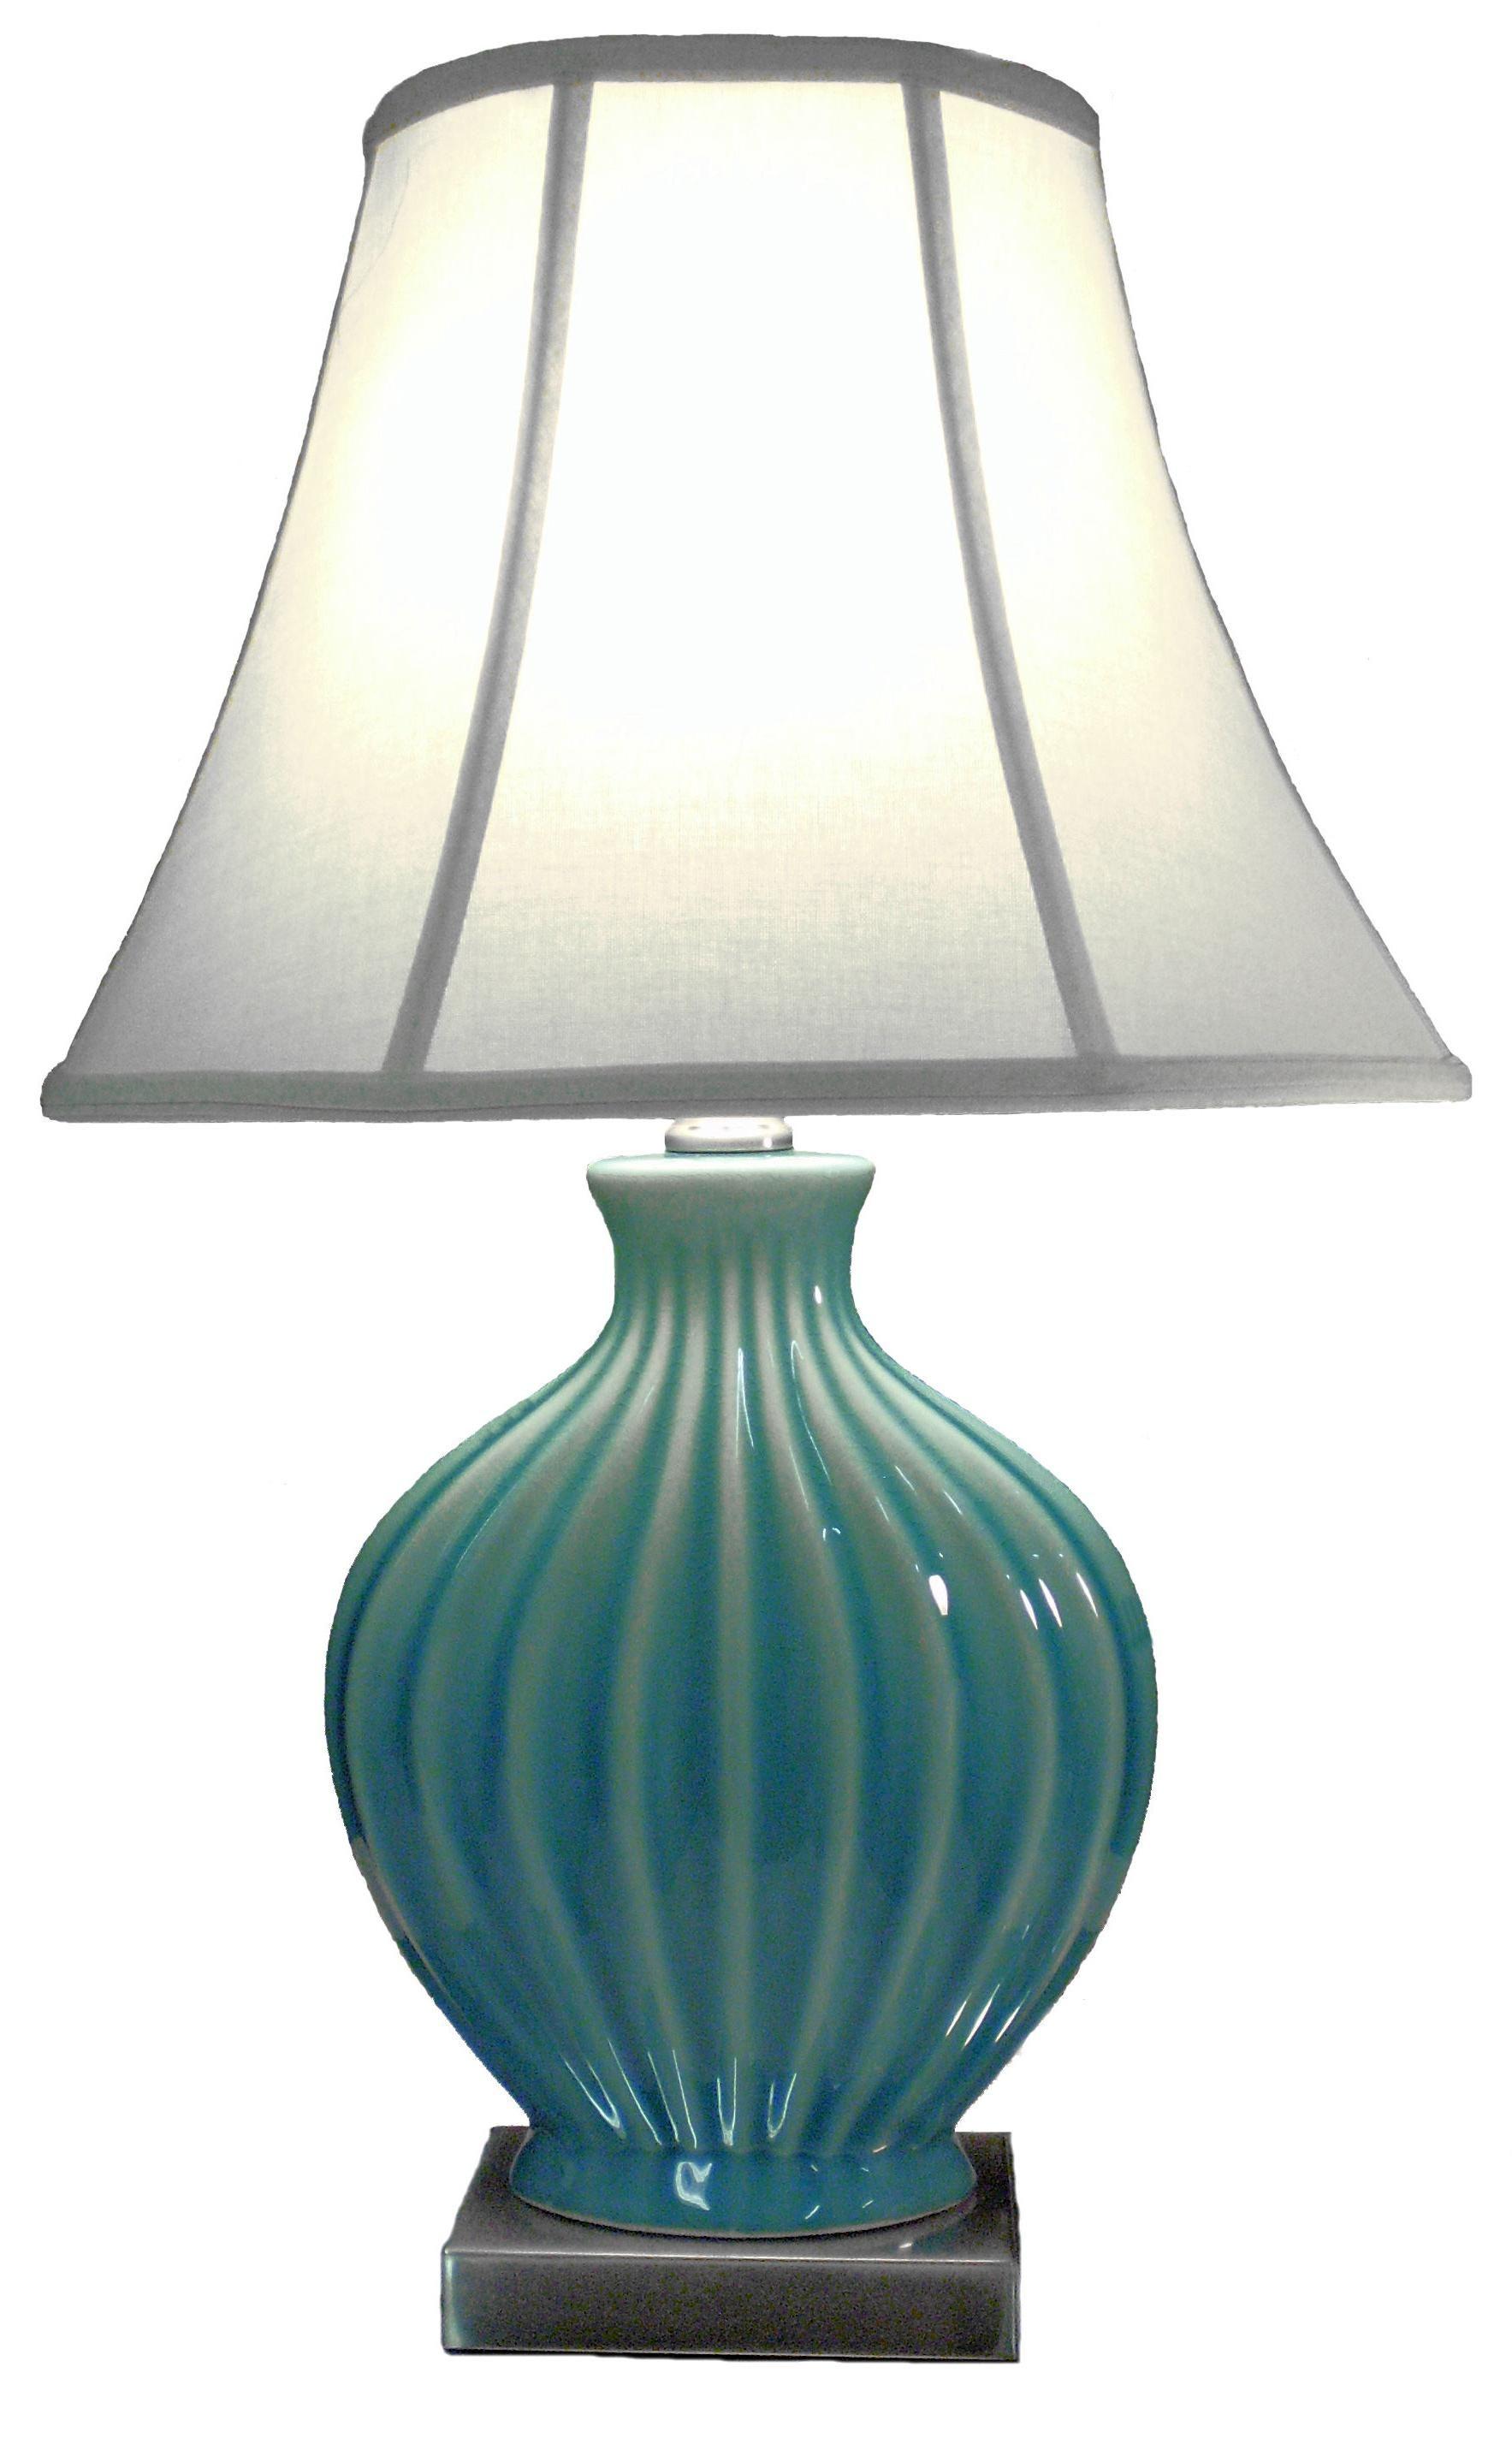 Melissa ceramic blue and teal table lamp lampsplus moms melissa ceramic blue and teal table lamp lampsplus aloadofball Gallery